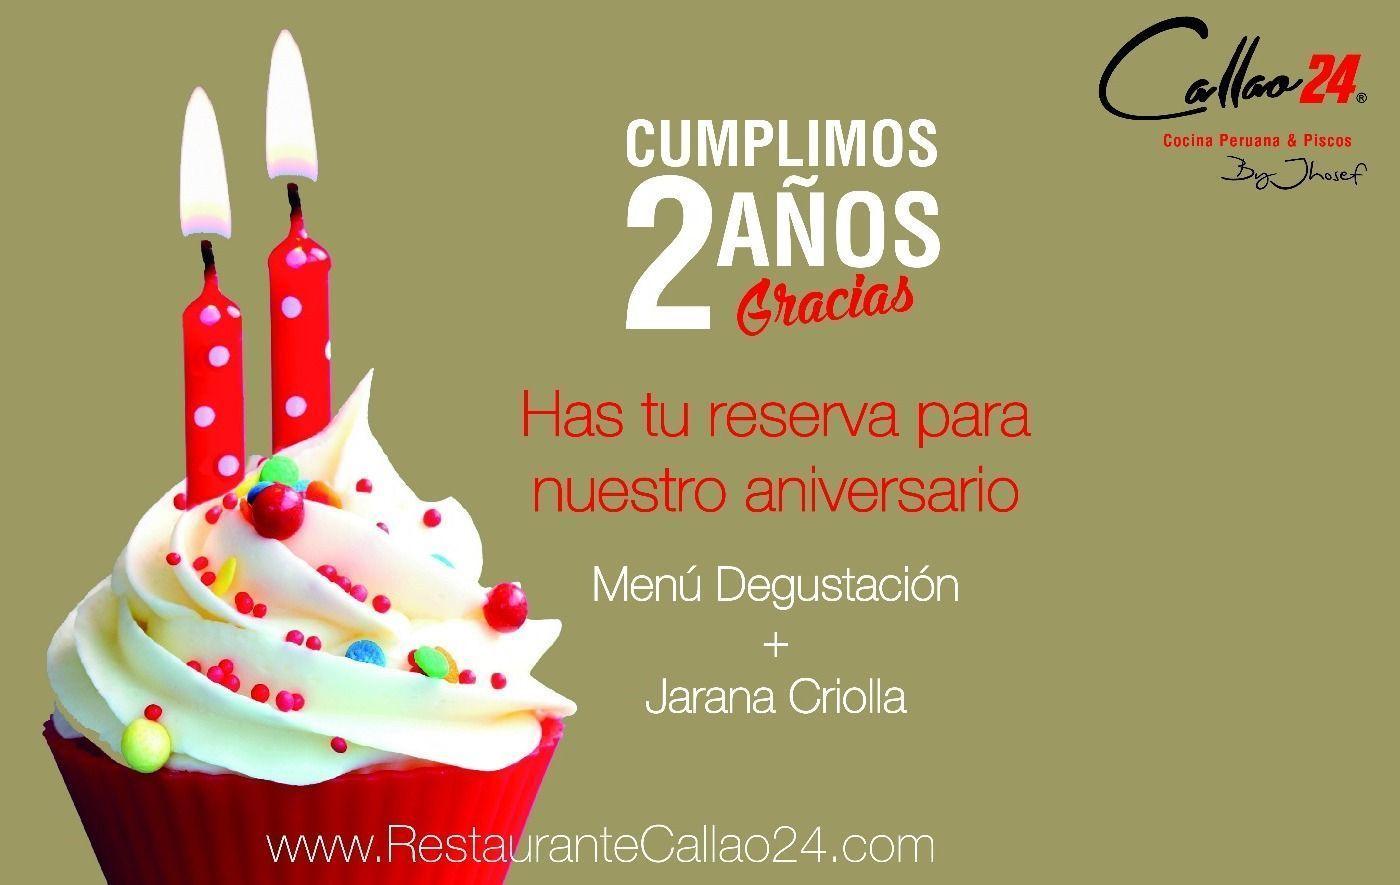 Aniversario-Restaurante-Callao24-Madrid-2017